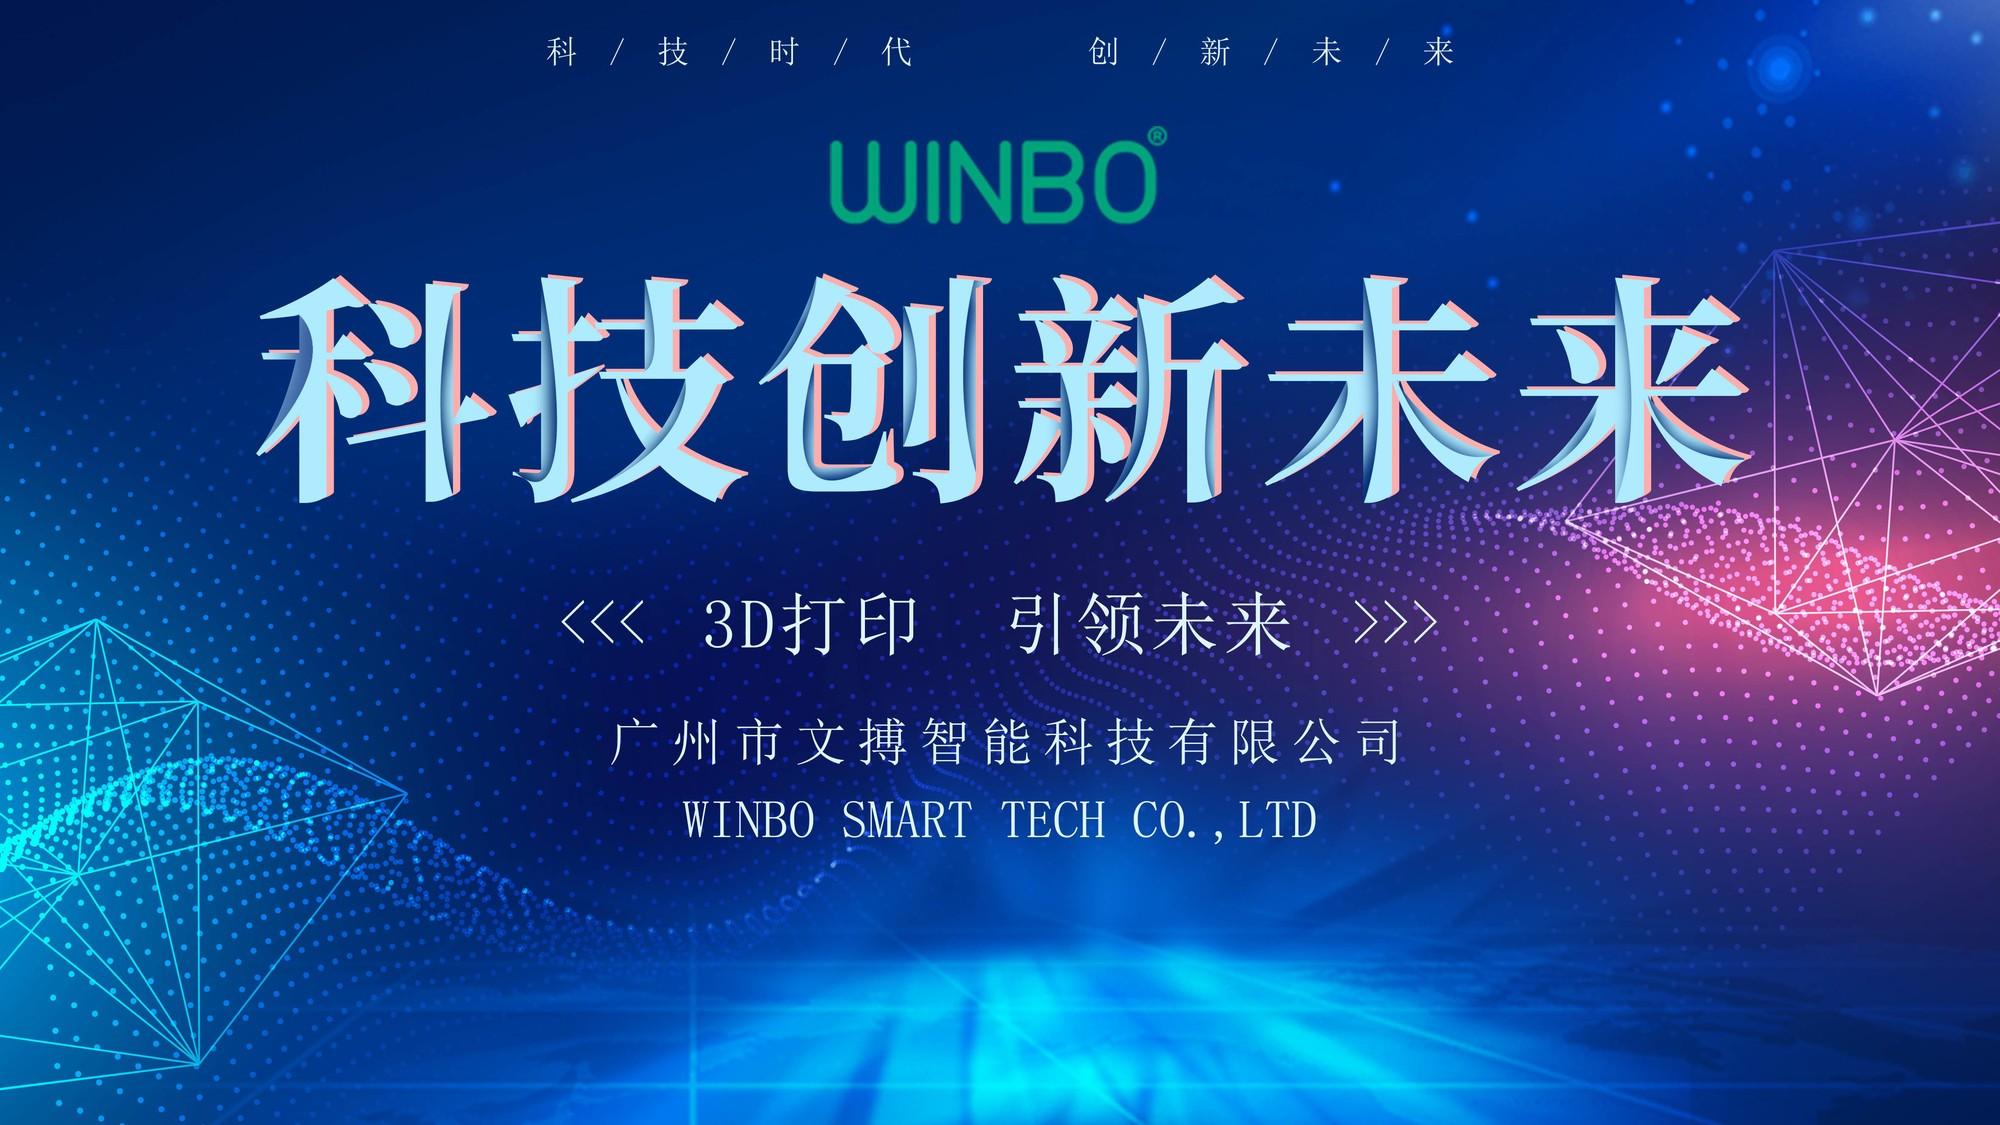 3D打印 引领未来 ― WINBO 3D打印机